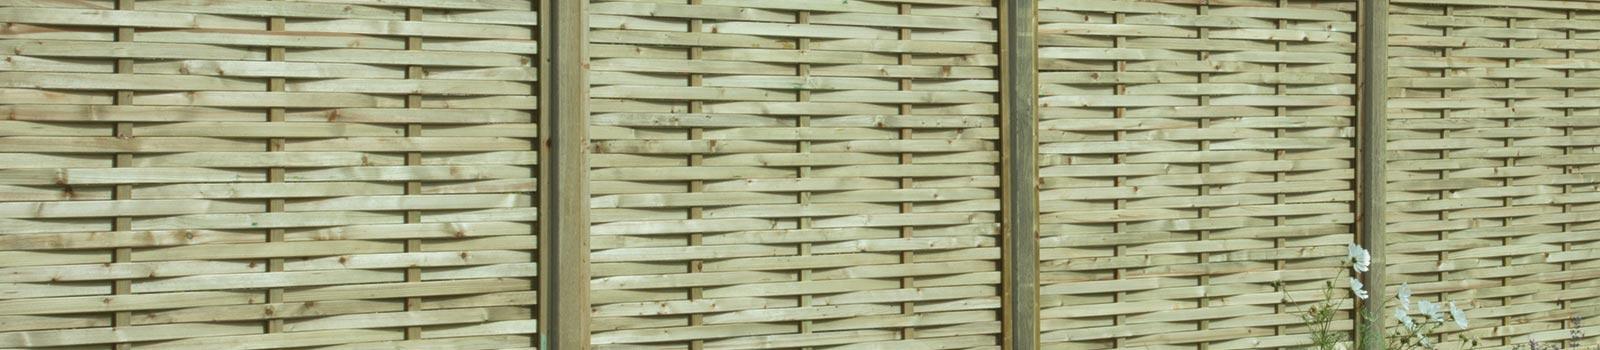 Premium woven fencing